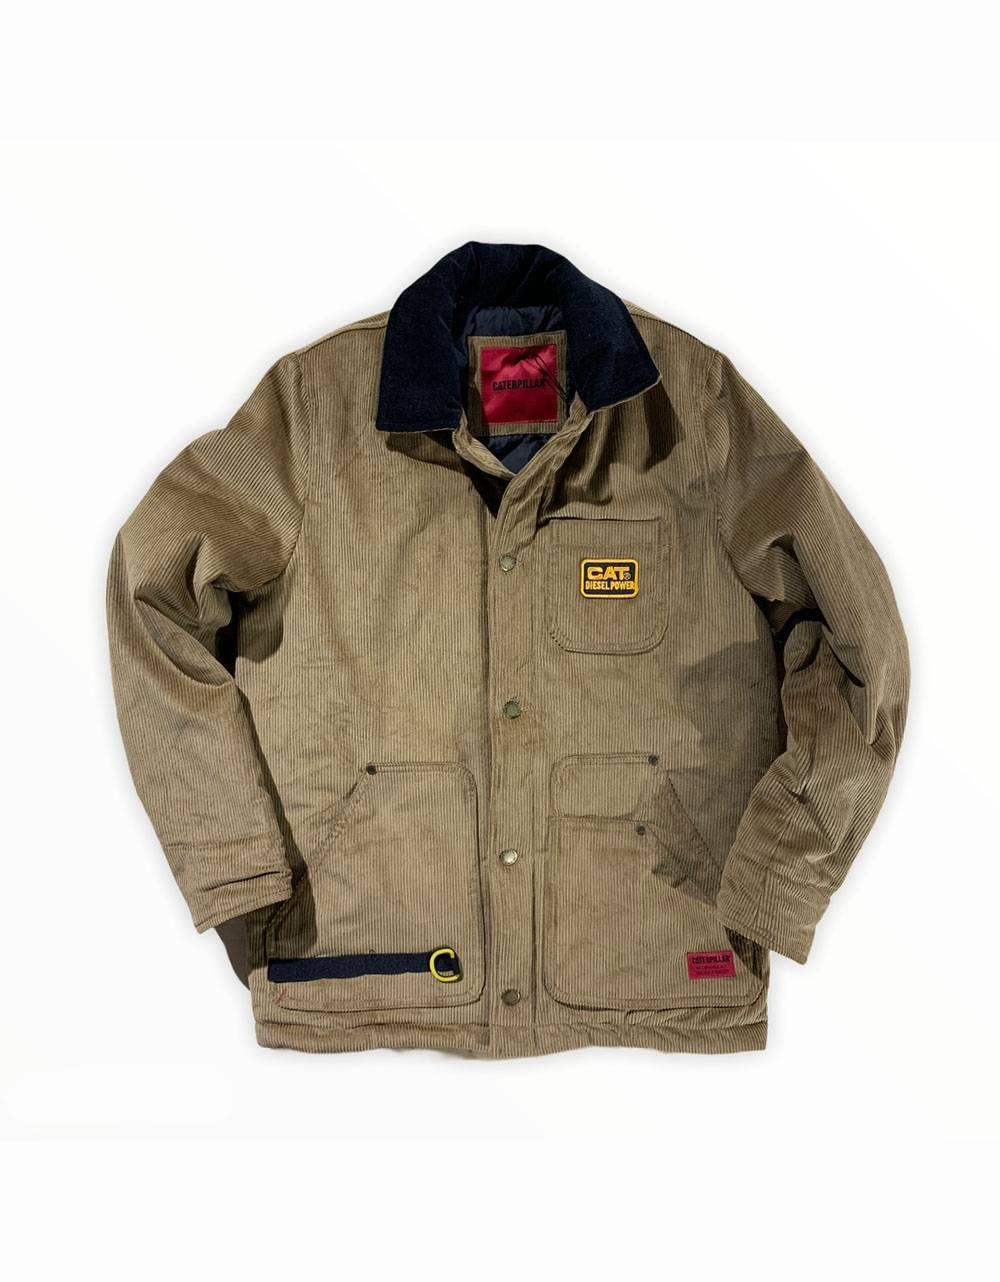 Cat Workwear Redefined Velvet Corduroy work jacket - cognac CAT WORKWEAR REDEFINED Jacket 159,84€